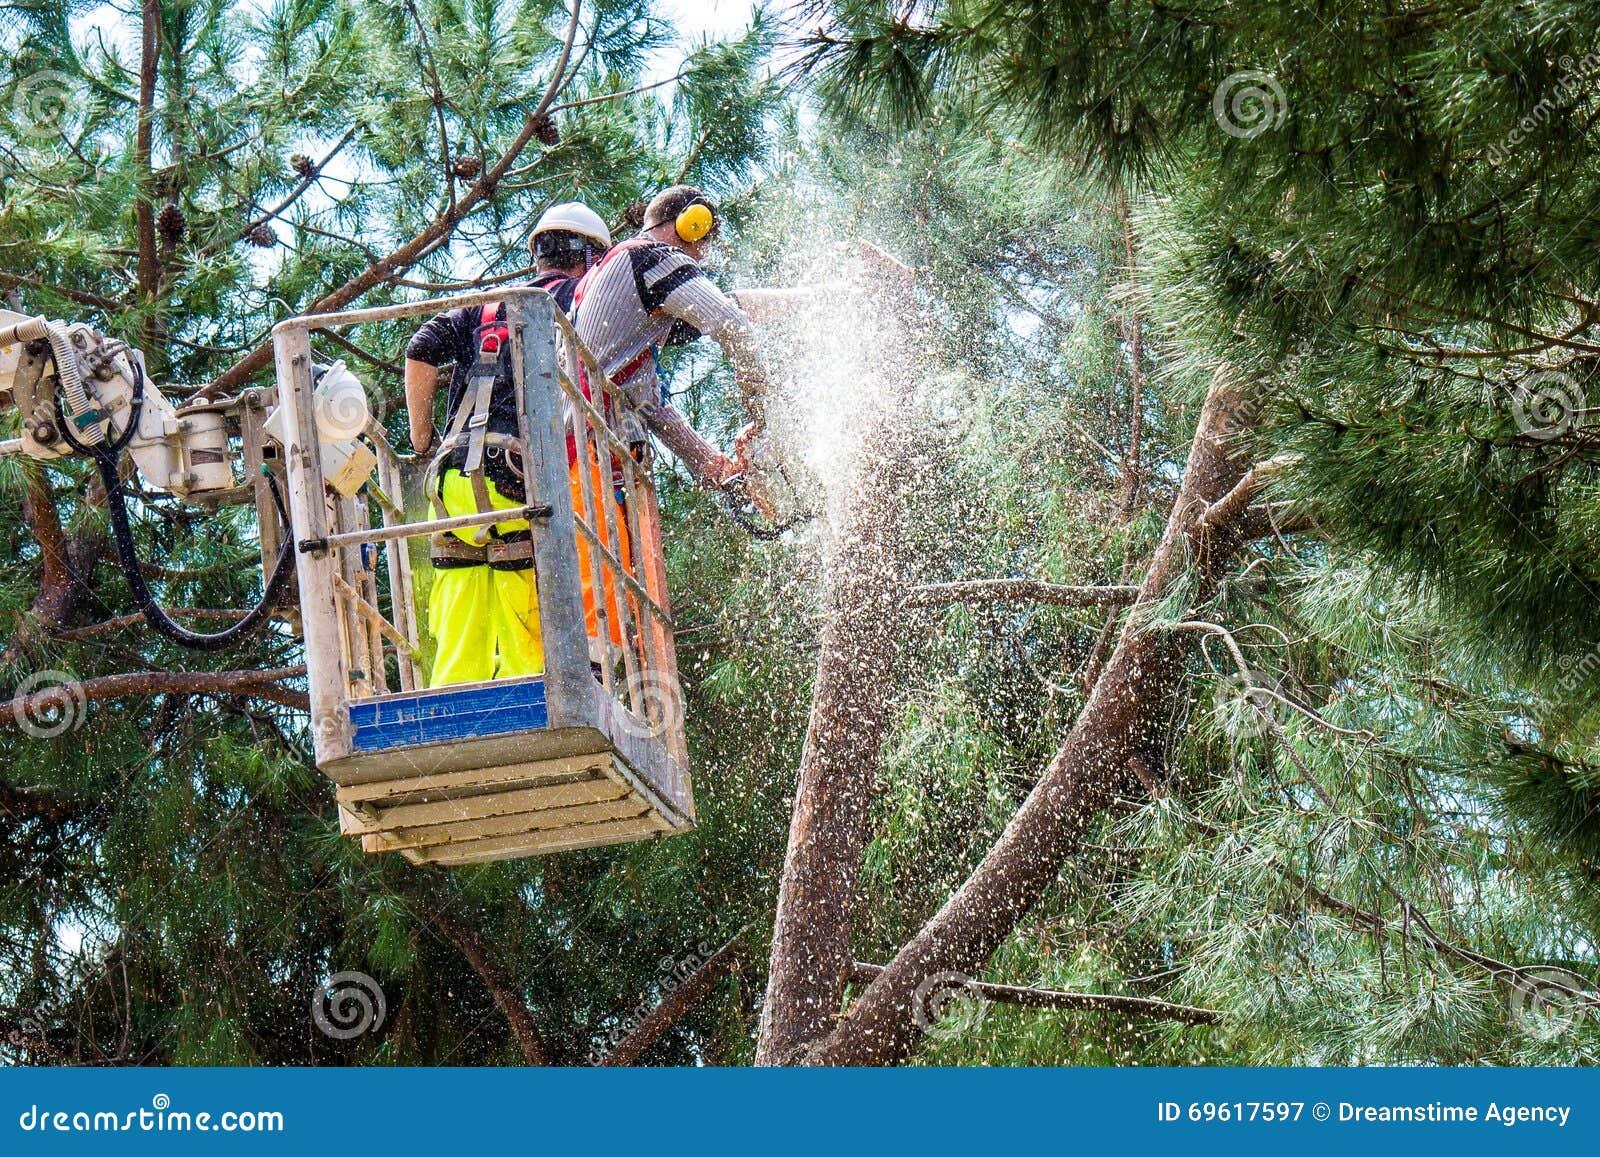 Professional Lumberjacks cuts trunks on the crane